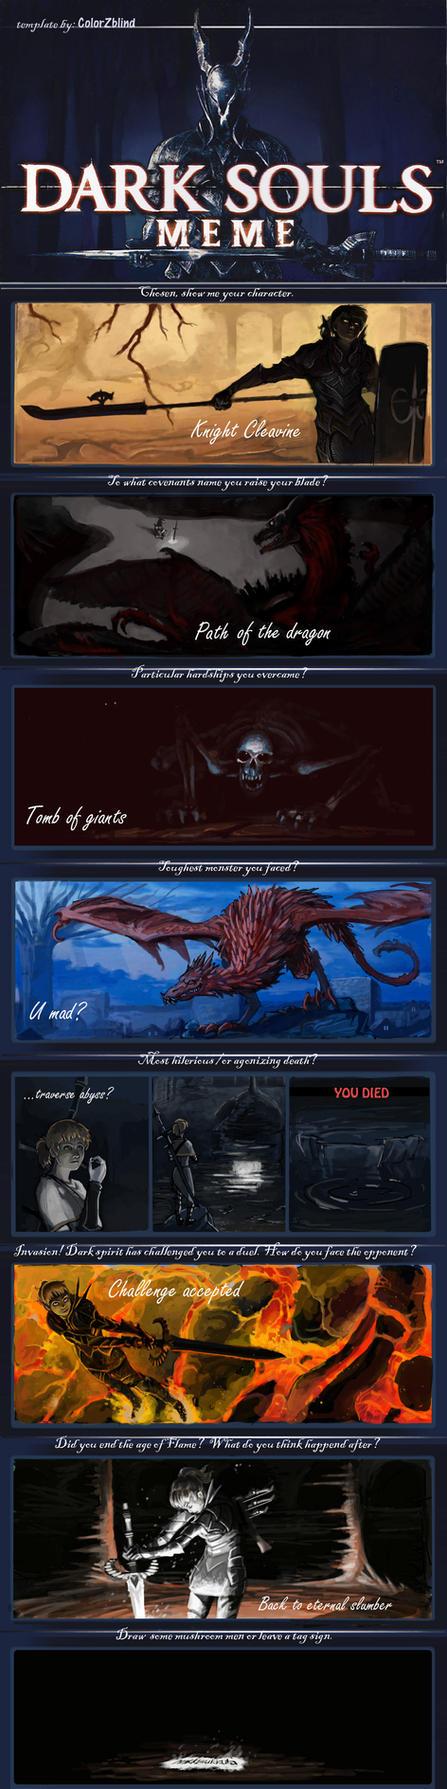 dark souls meme  spoilers  by colorzblind on deviantart